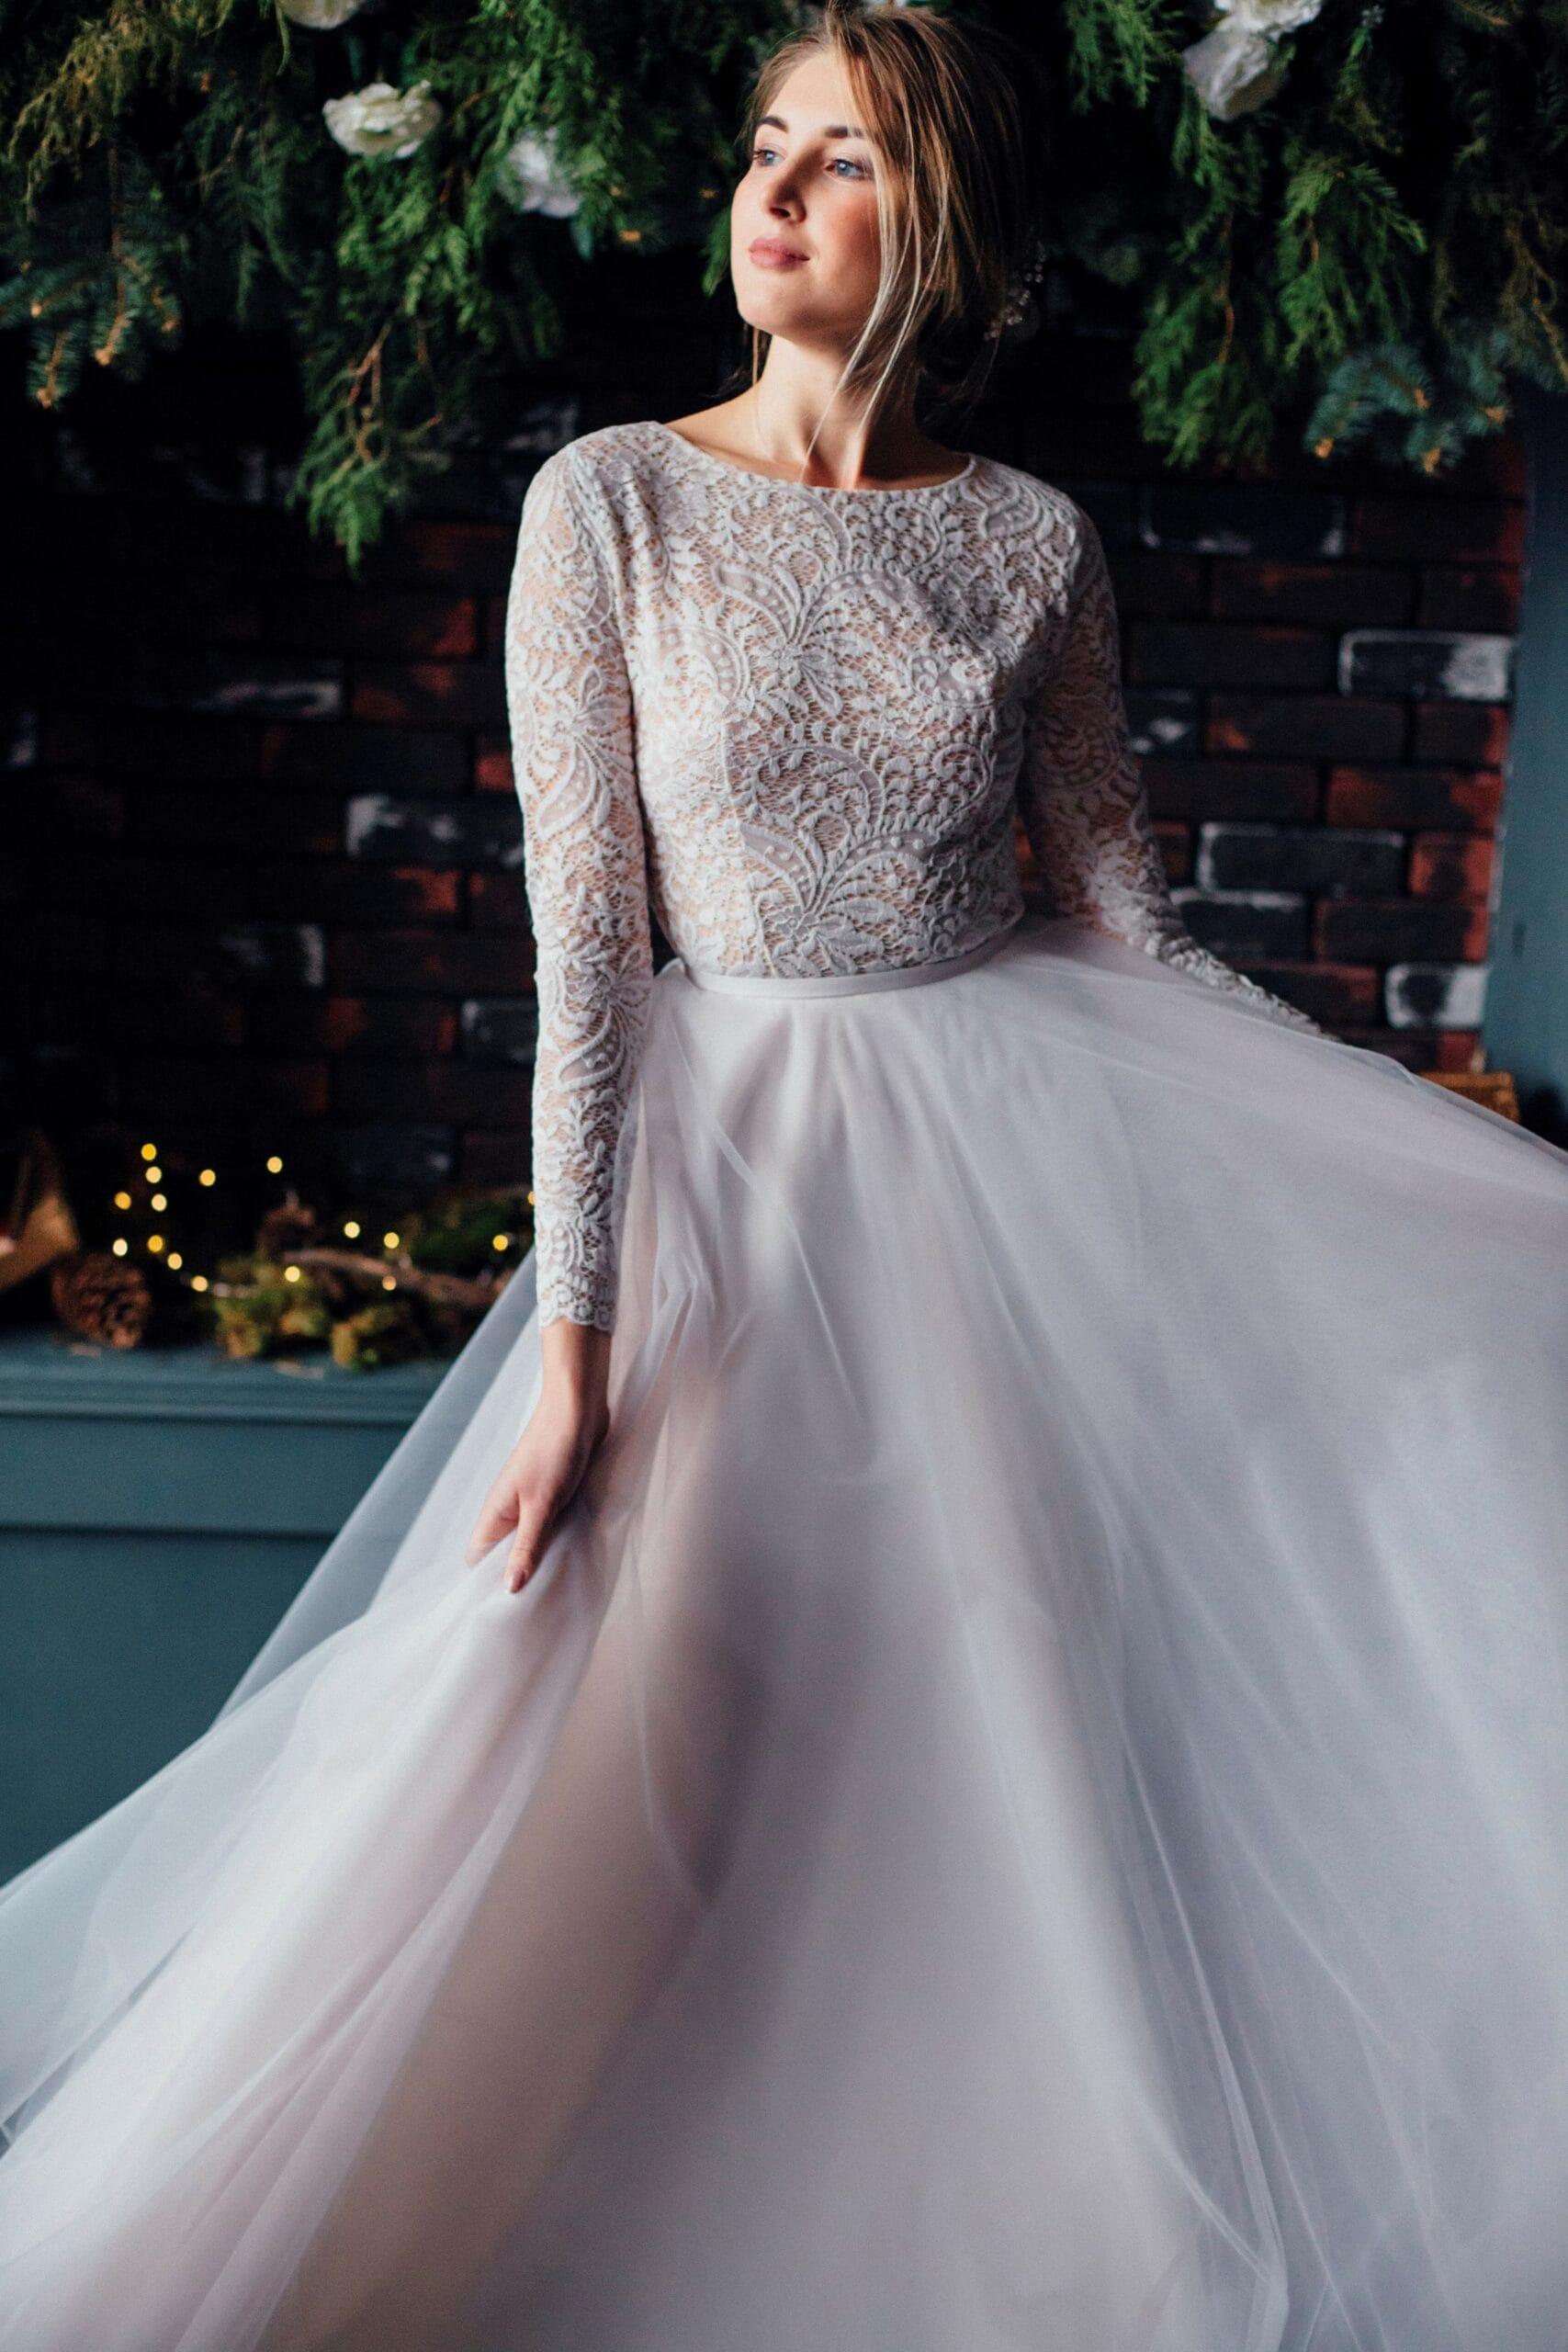 Свадебное платье CAROLINE, коллекция THE ABSOLUTE LOVE, бренд RARE BRIDAL, фото 1